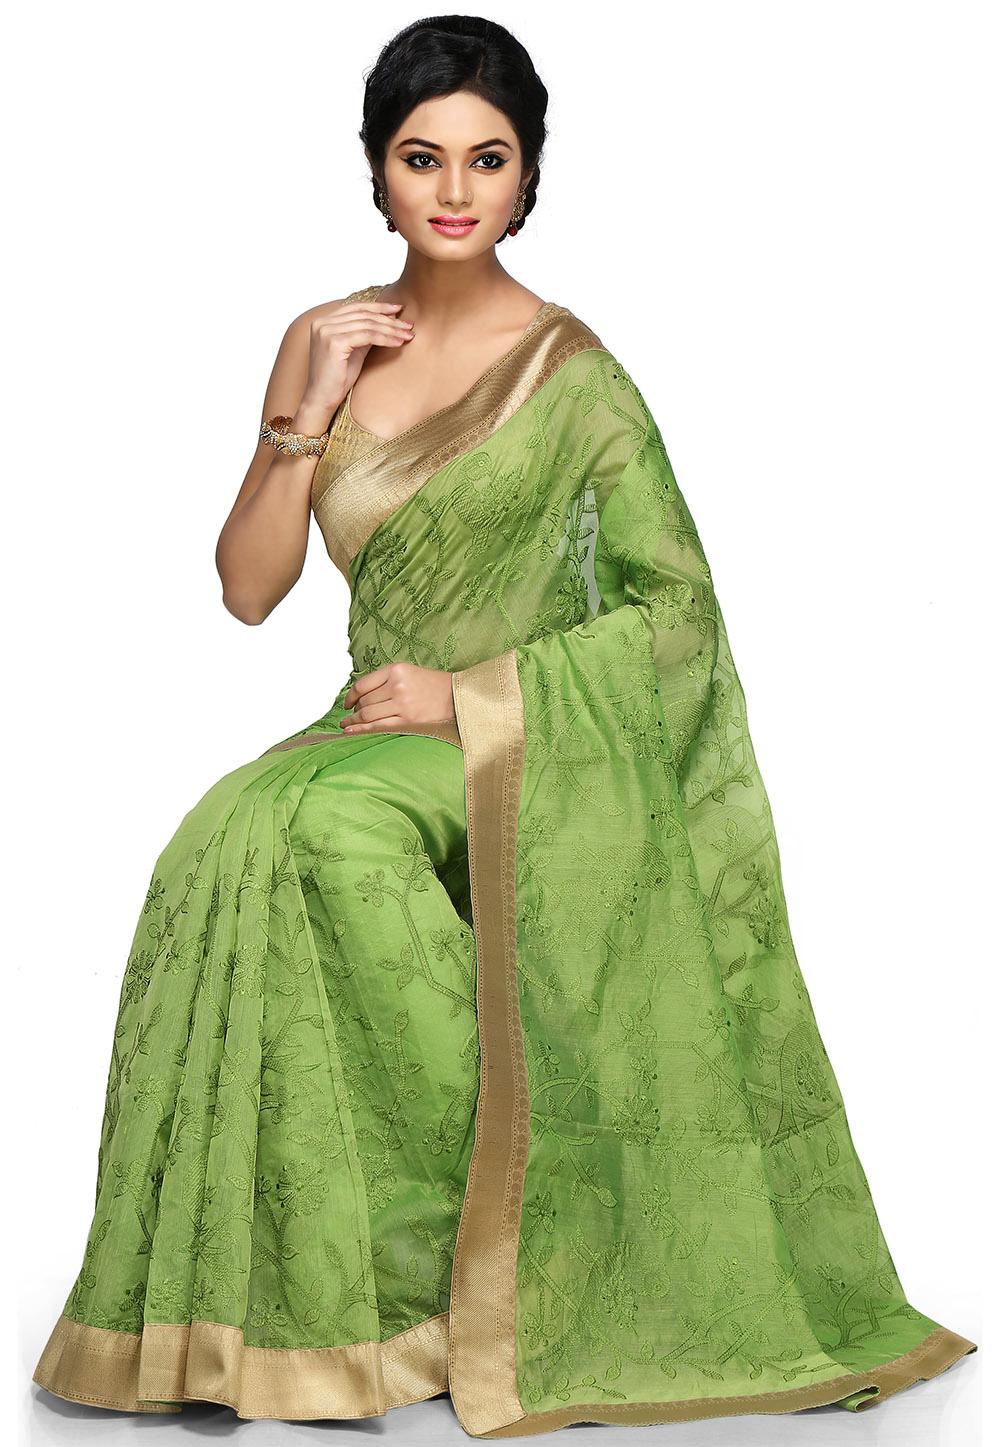 A Green Saree. (Image: Utsavfashion.com)